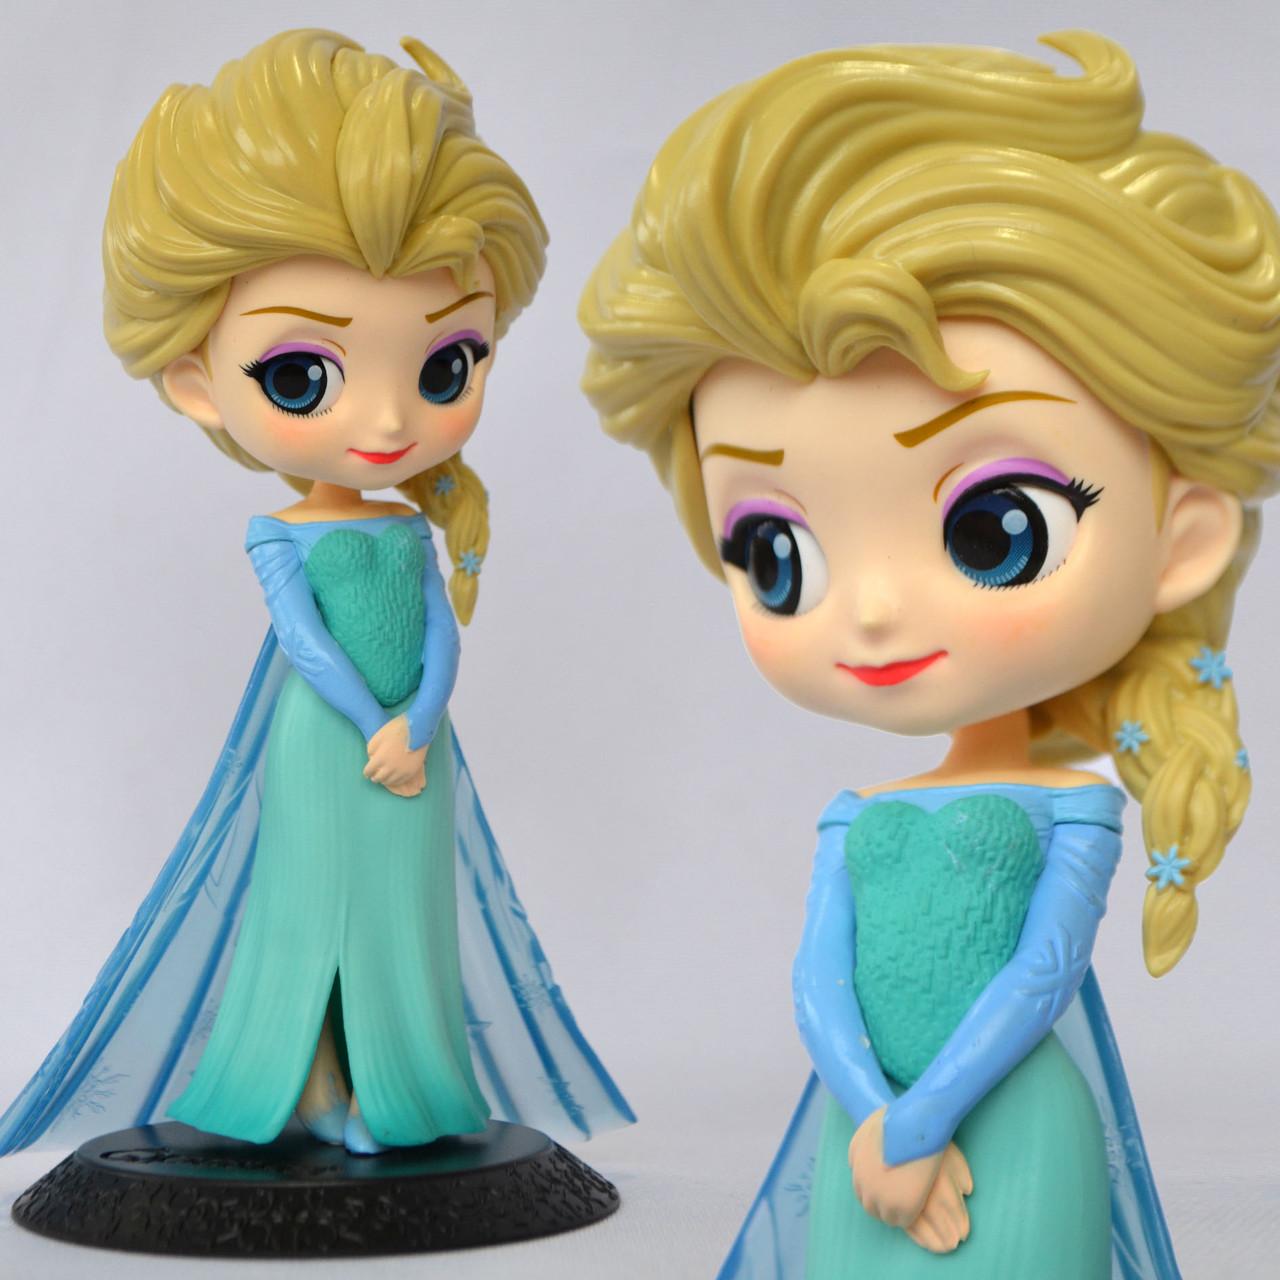 Фігурка Disney Characters: Frozen - Elsa, Q posket